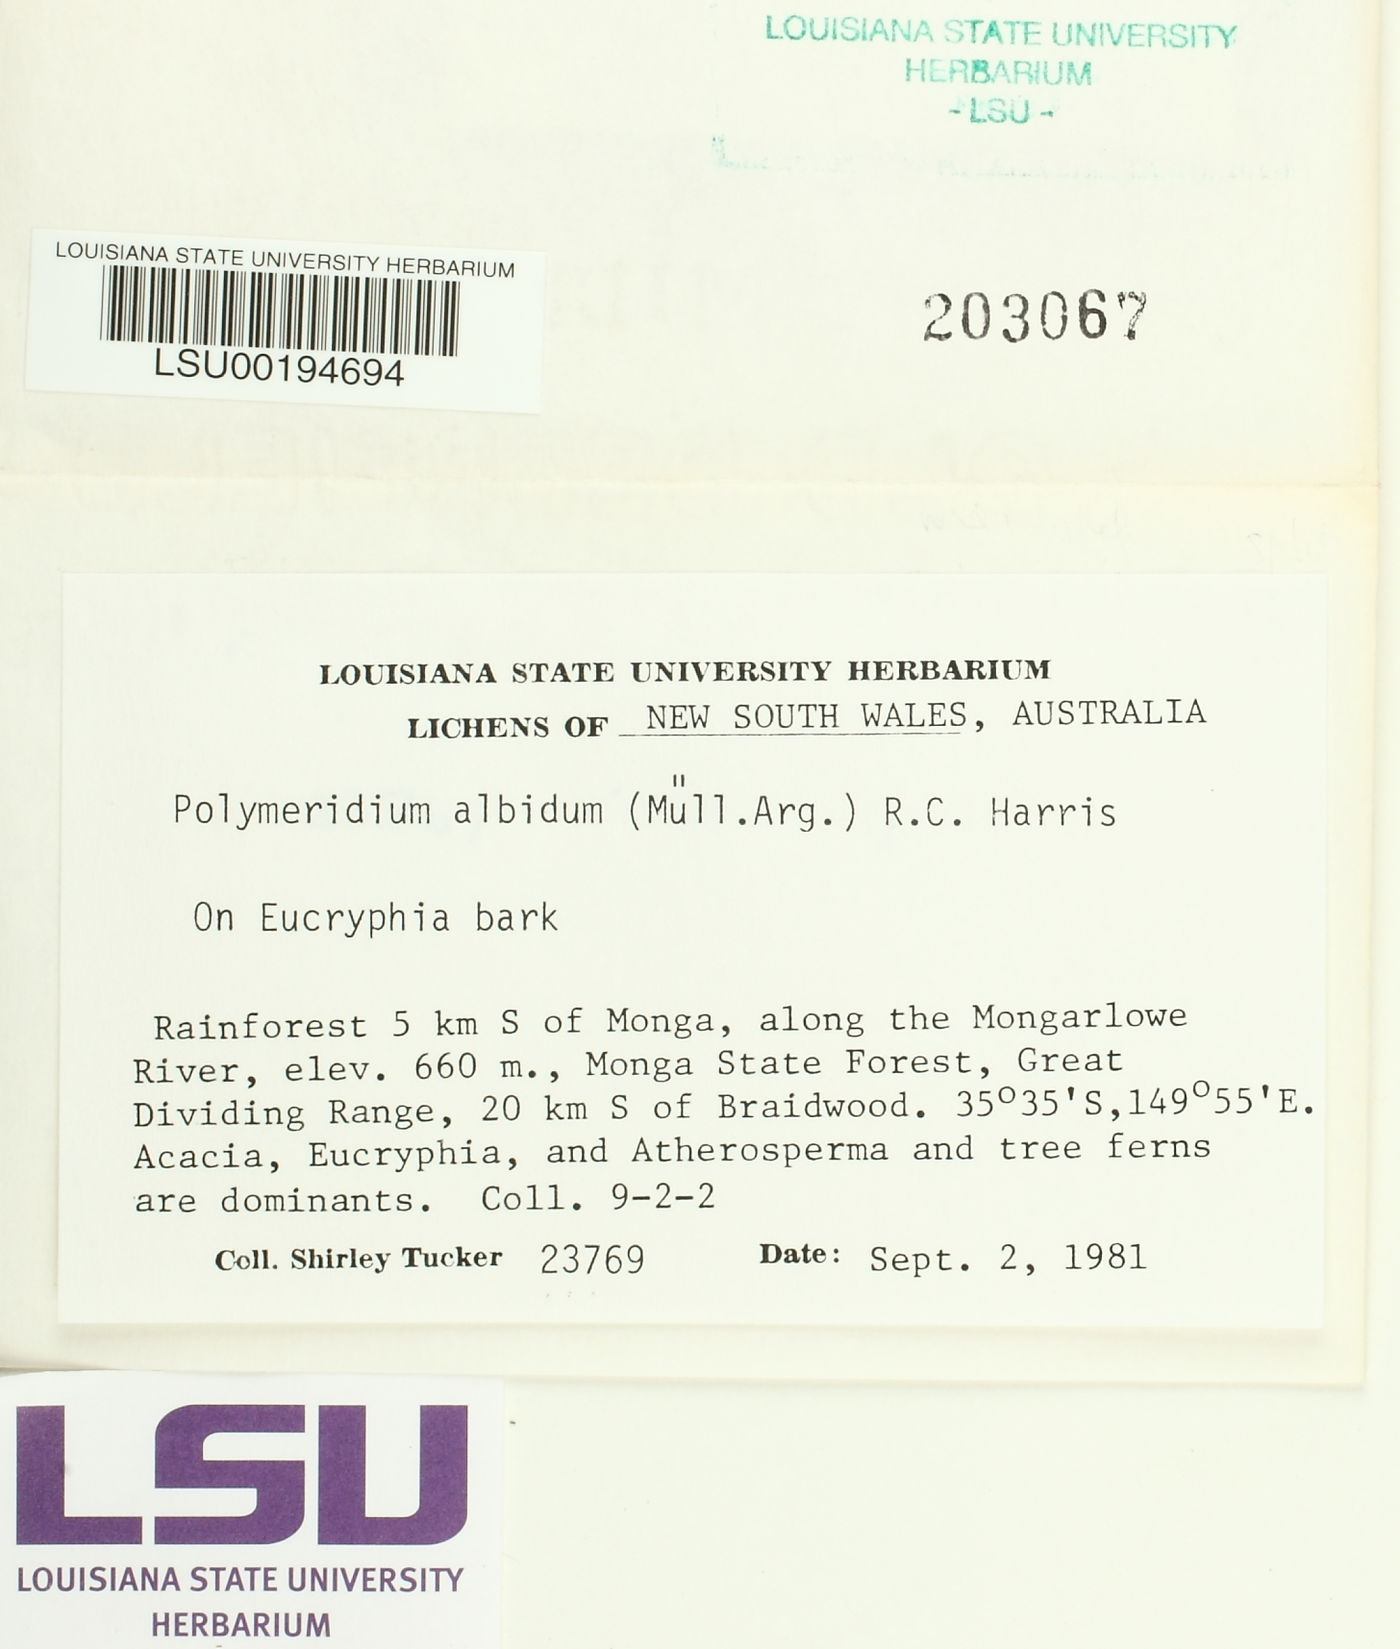 Polymeridium albidum image